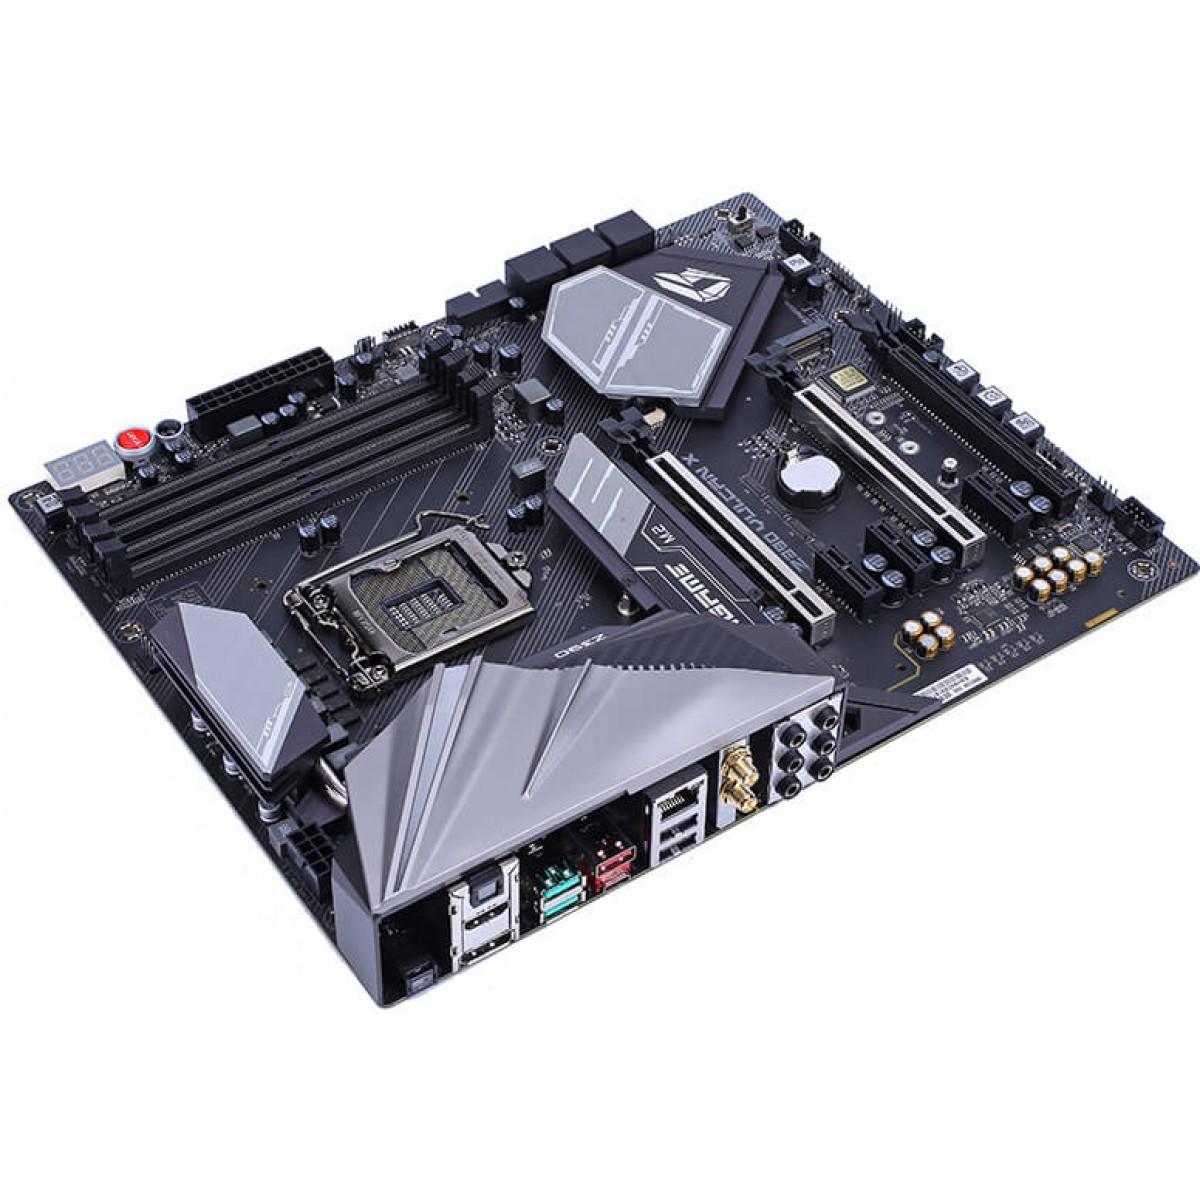 Placa Mãe Colorful iGame Z390 Vulcan X V20, Chipset Z390, Intel LGA 1151, ATX, DDR4